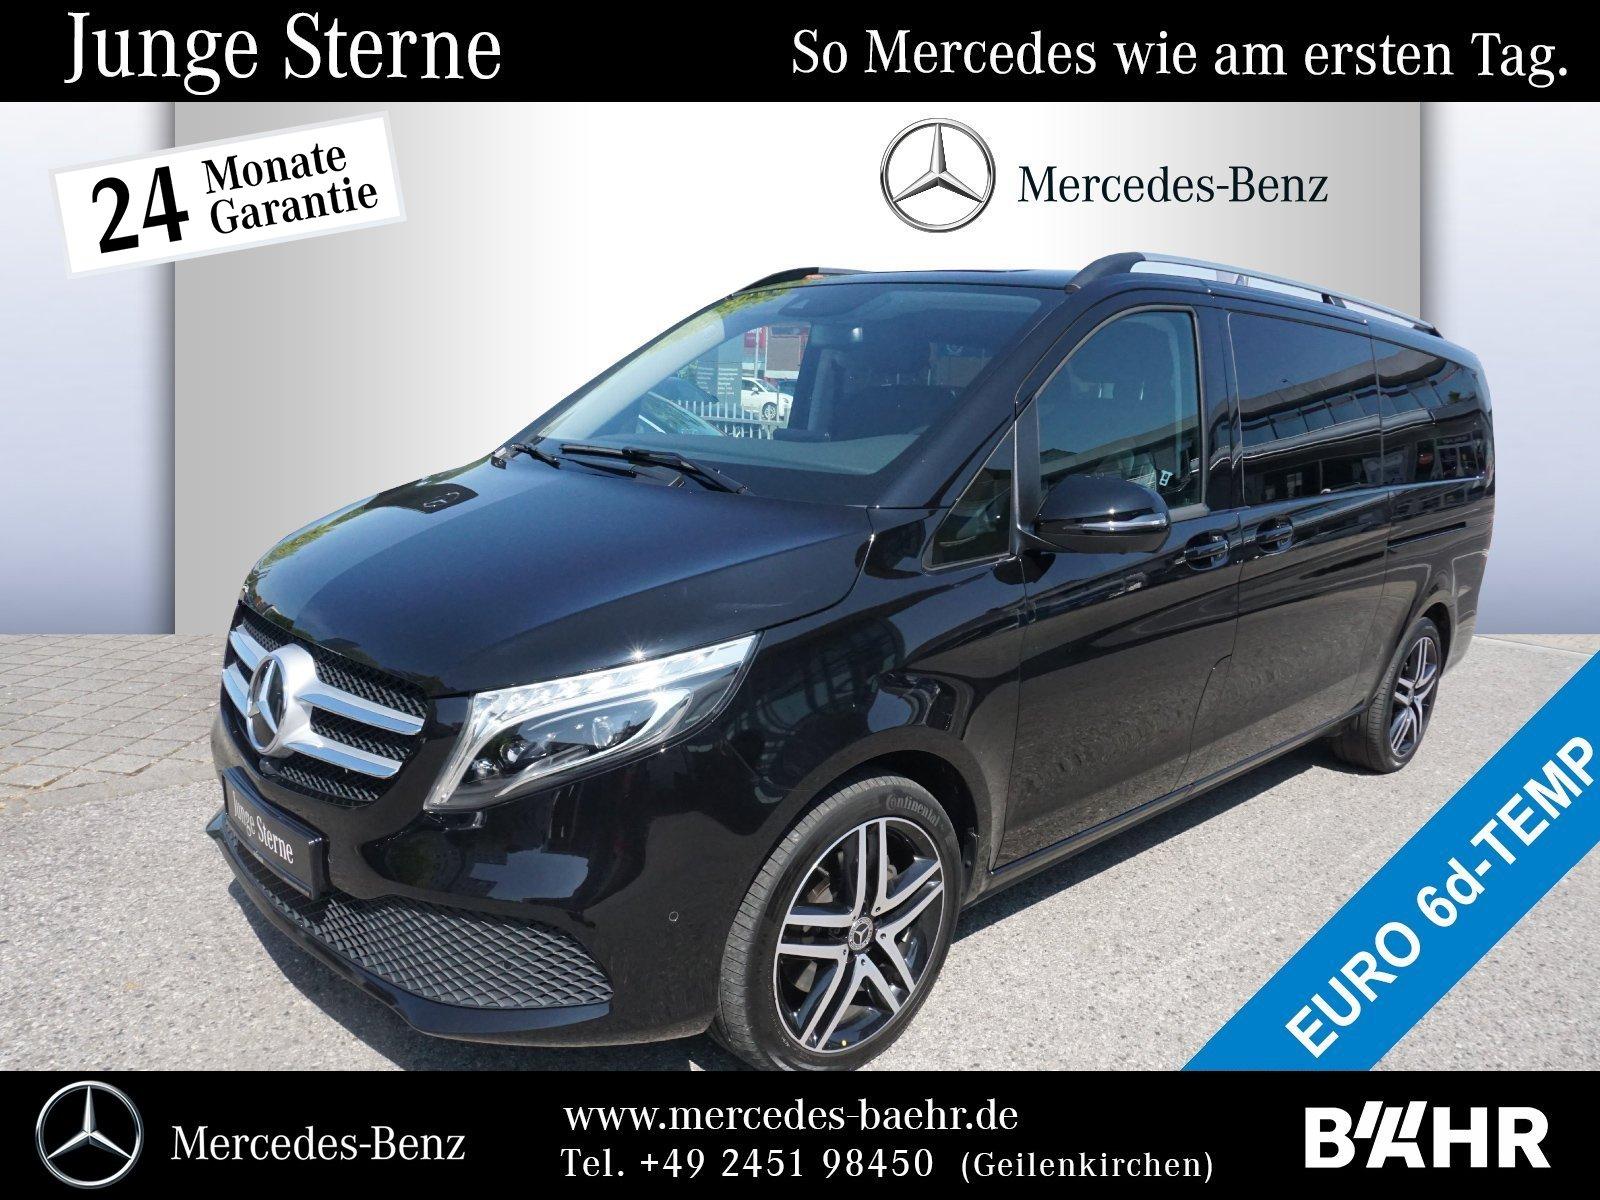 "Mercedes-Benz V 300 d Extralang Navi/ILS/360°/SHZ/8-Sitze/19"", Jahr 2019, diesel"